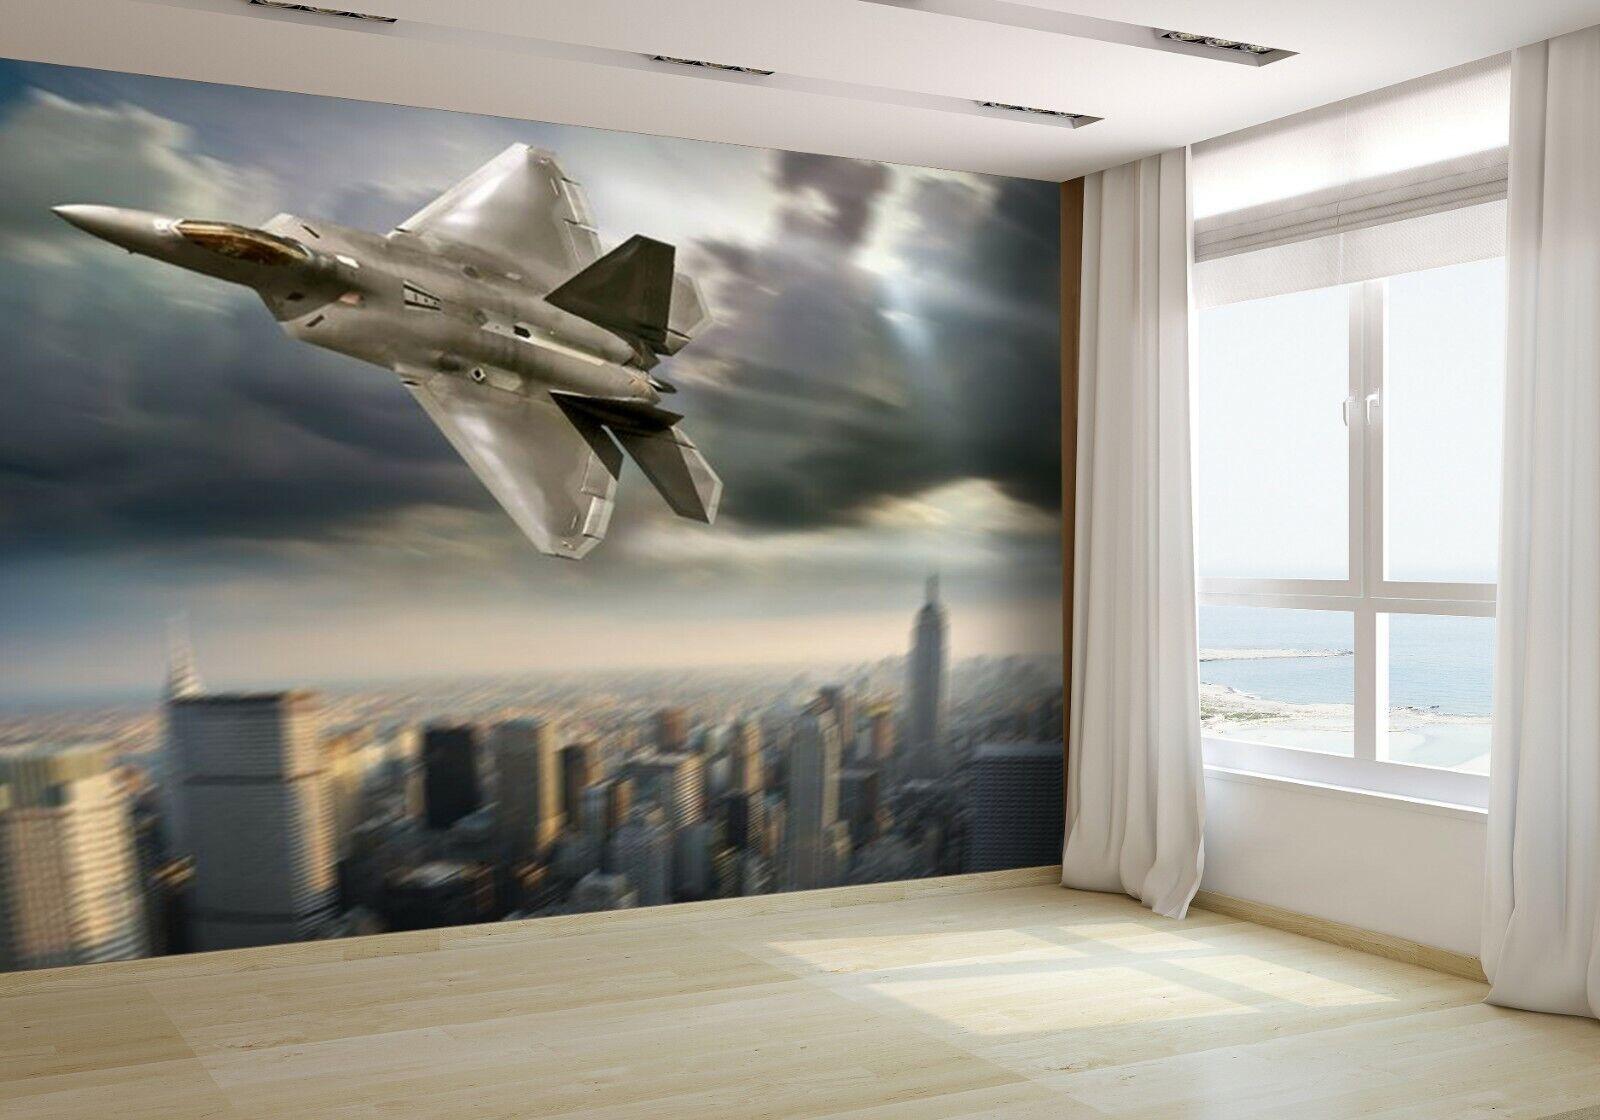 Jet fighter Wallpaper Mural Photo 12885106 budget paper